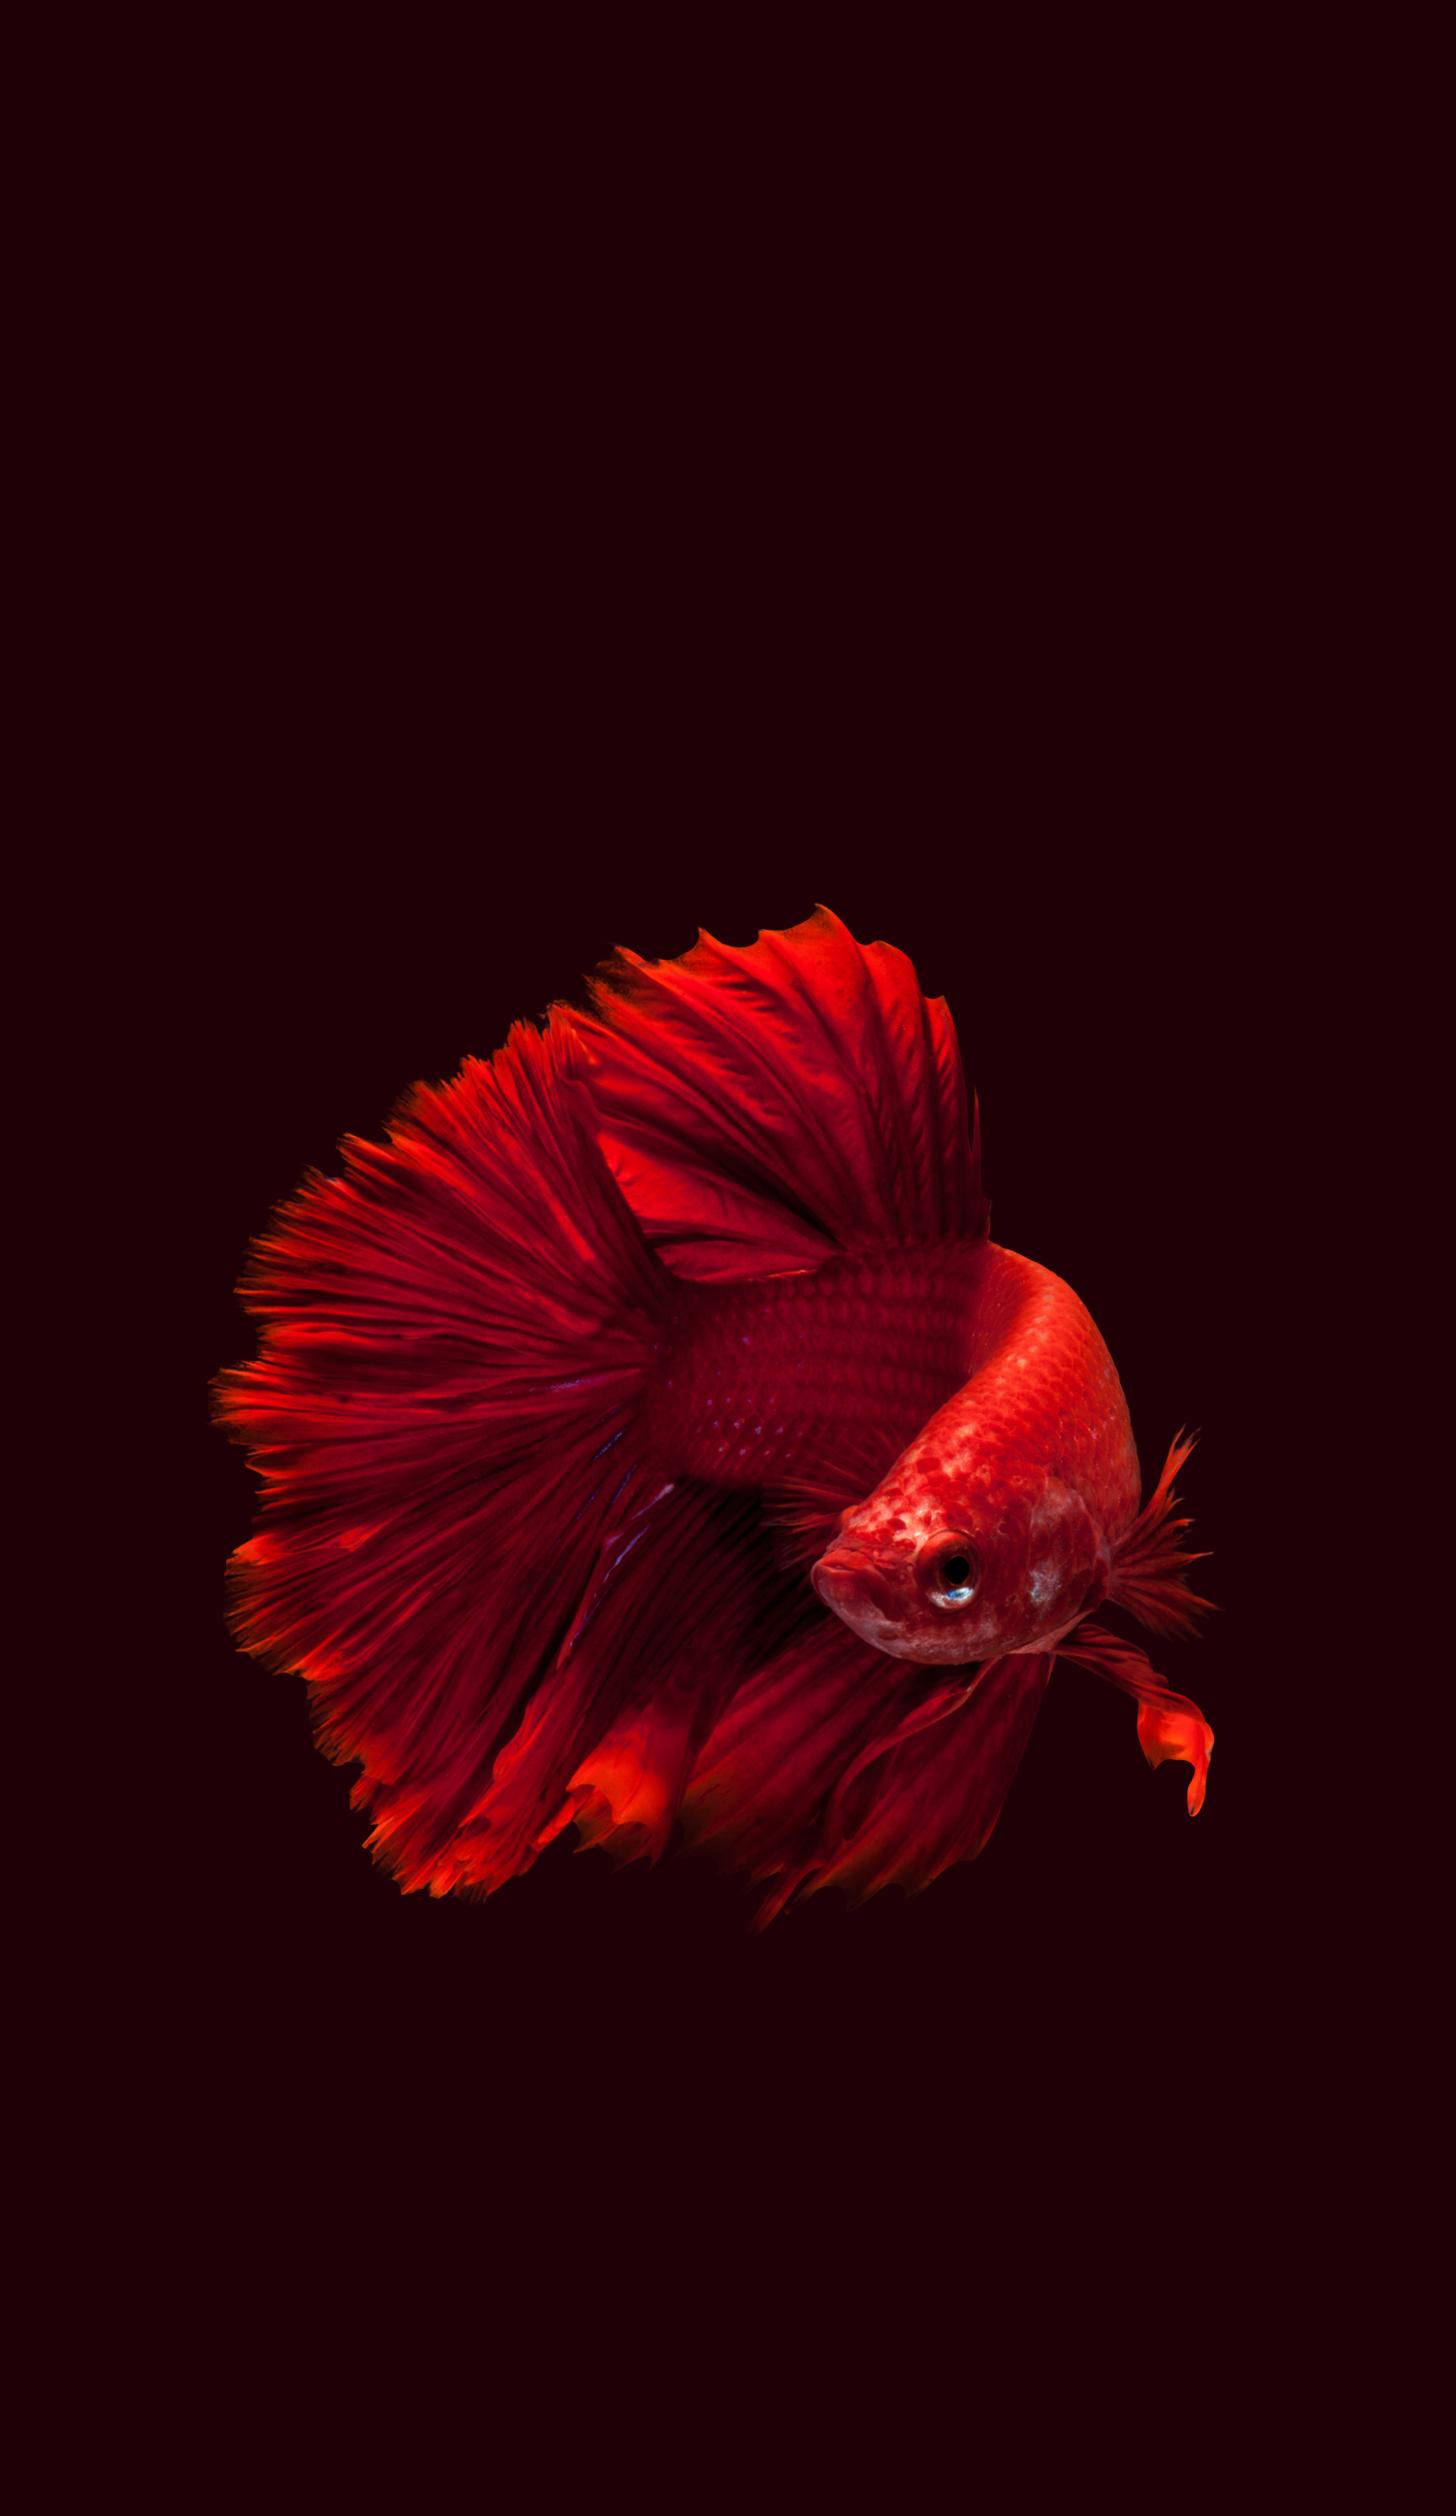 All Animals Wallpaper Dump Fish Wallpaper Siamese Fighting Fish Betta Fish